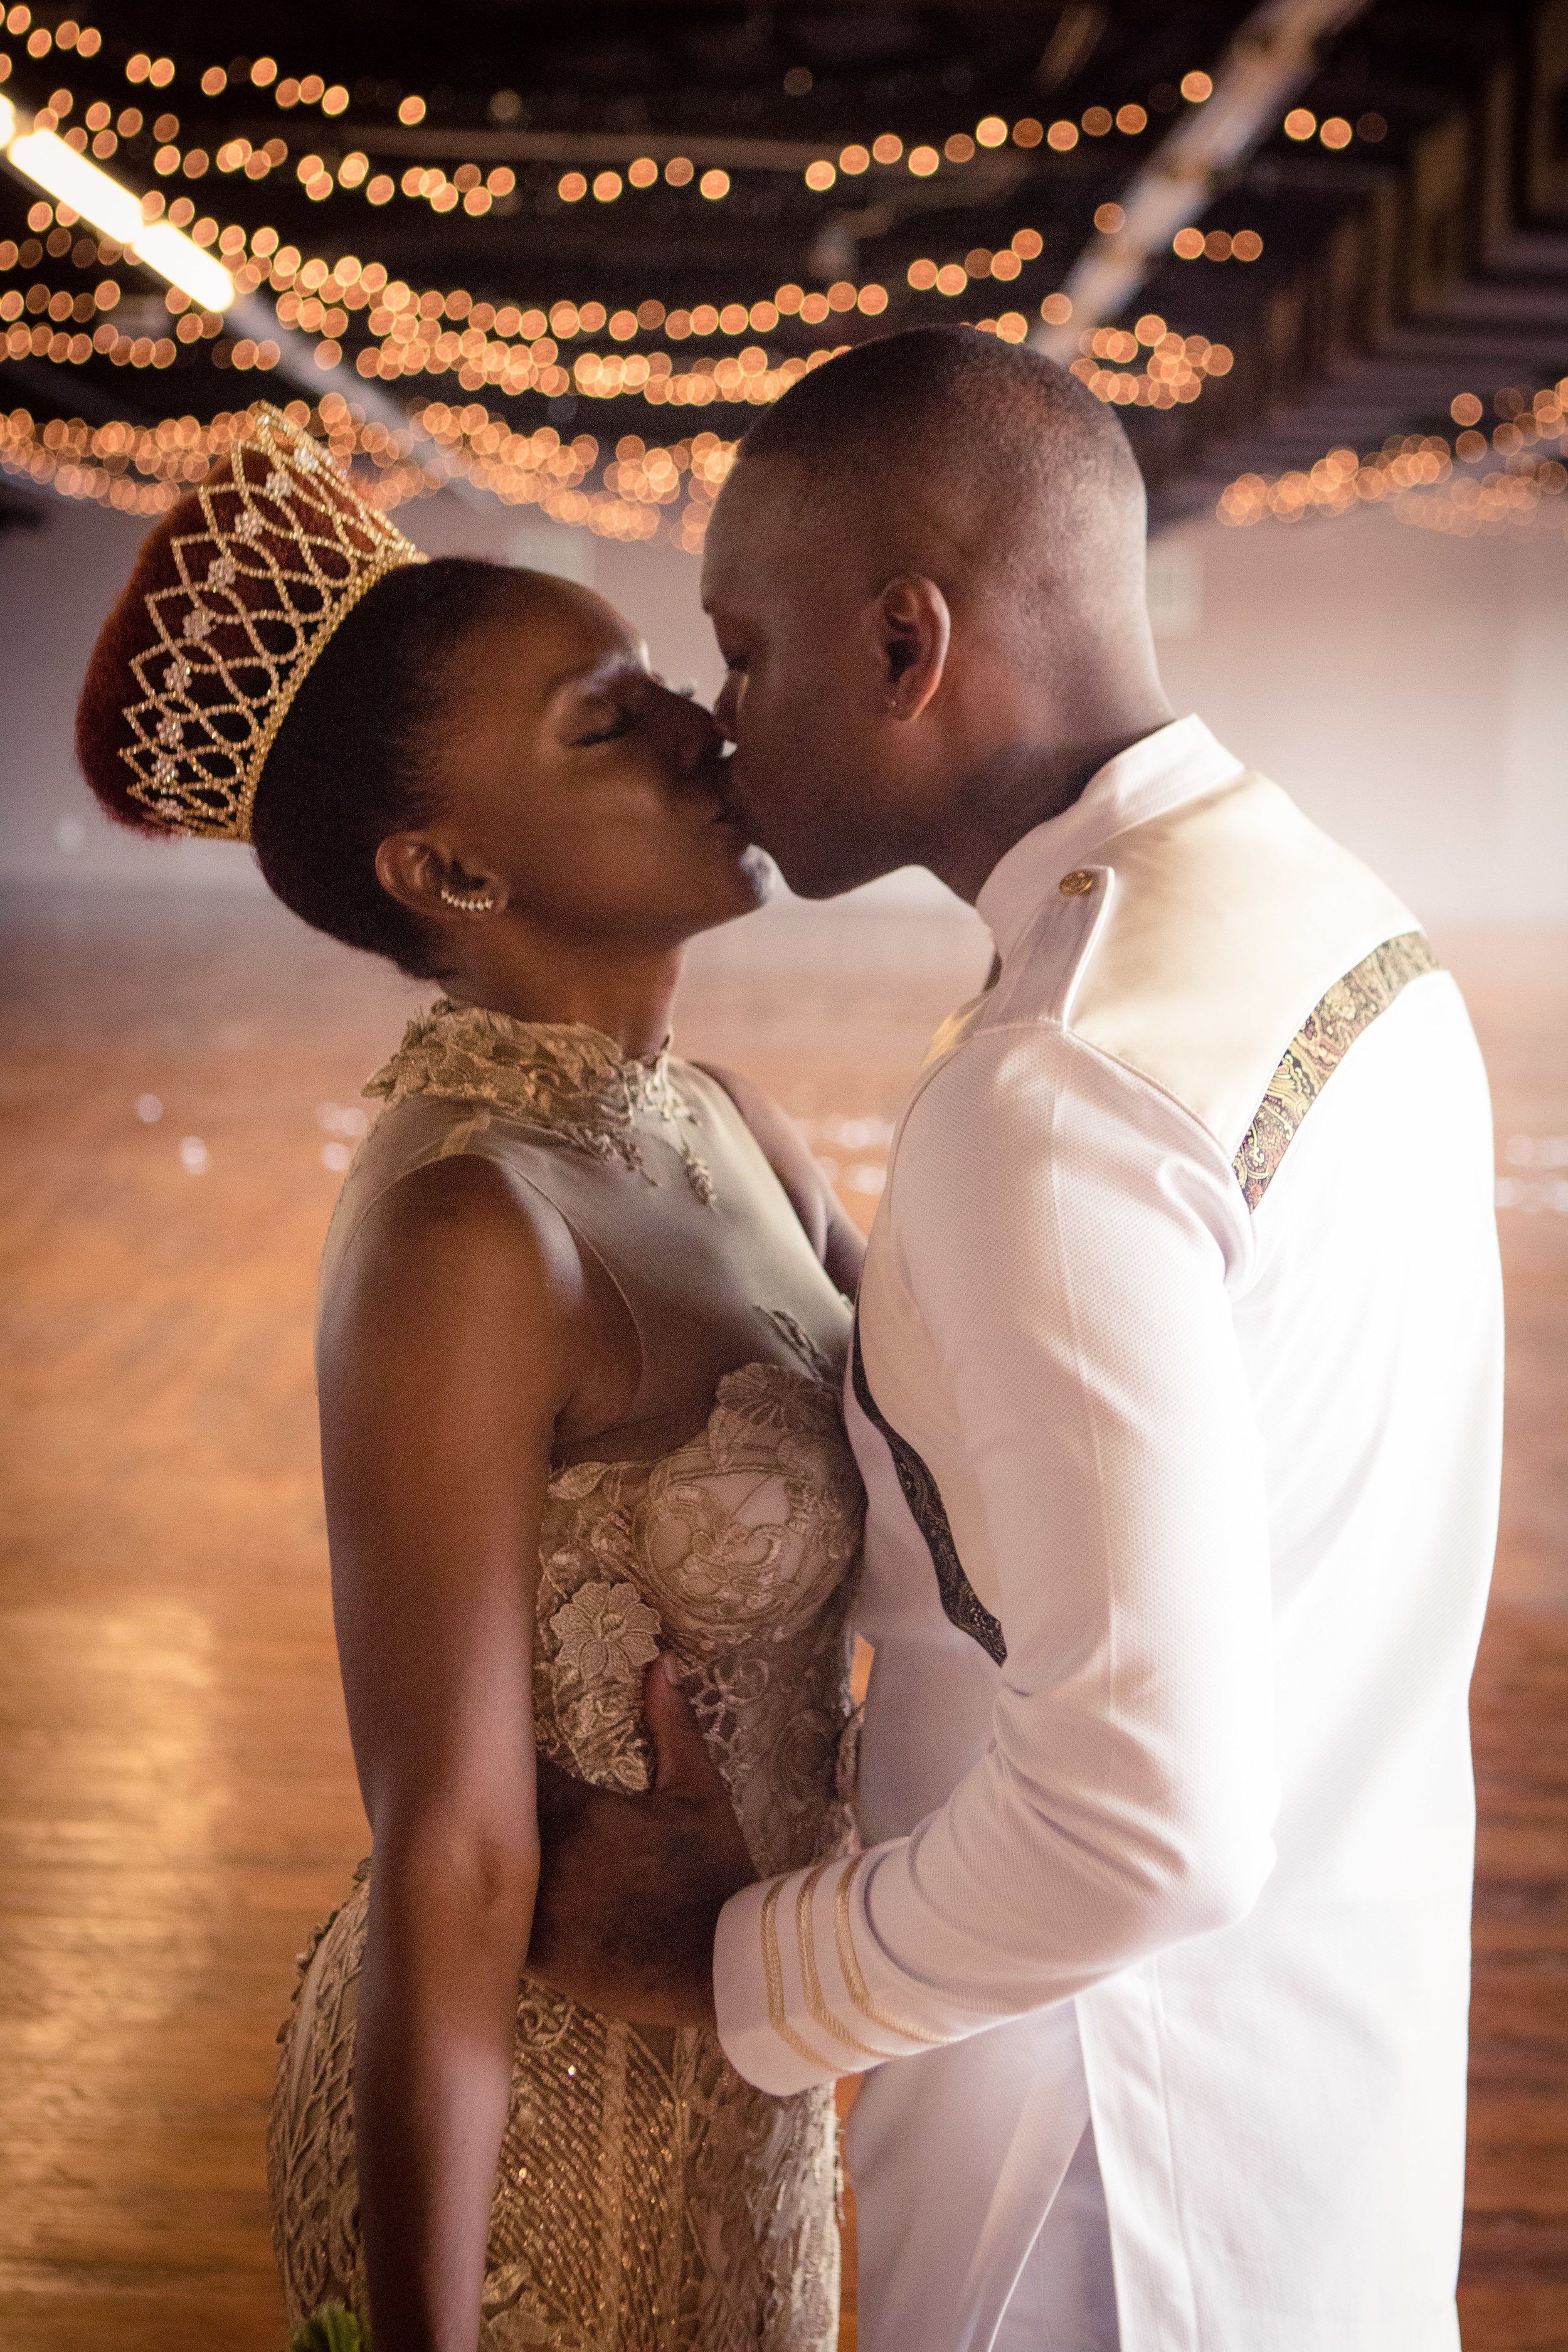 Designer: Tabitha Fielteau & Groom (groom's outfit by  Threaded Culture )